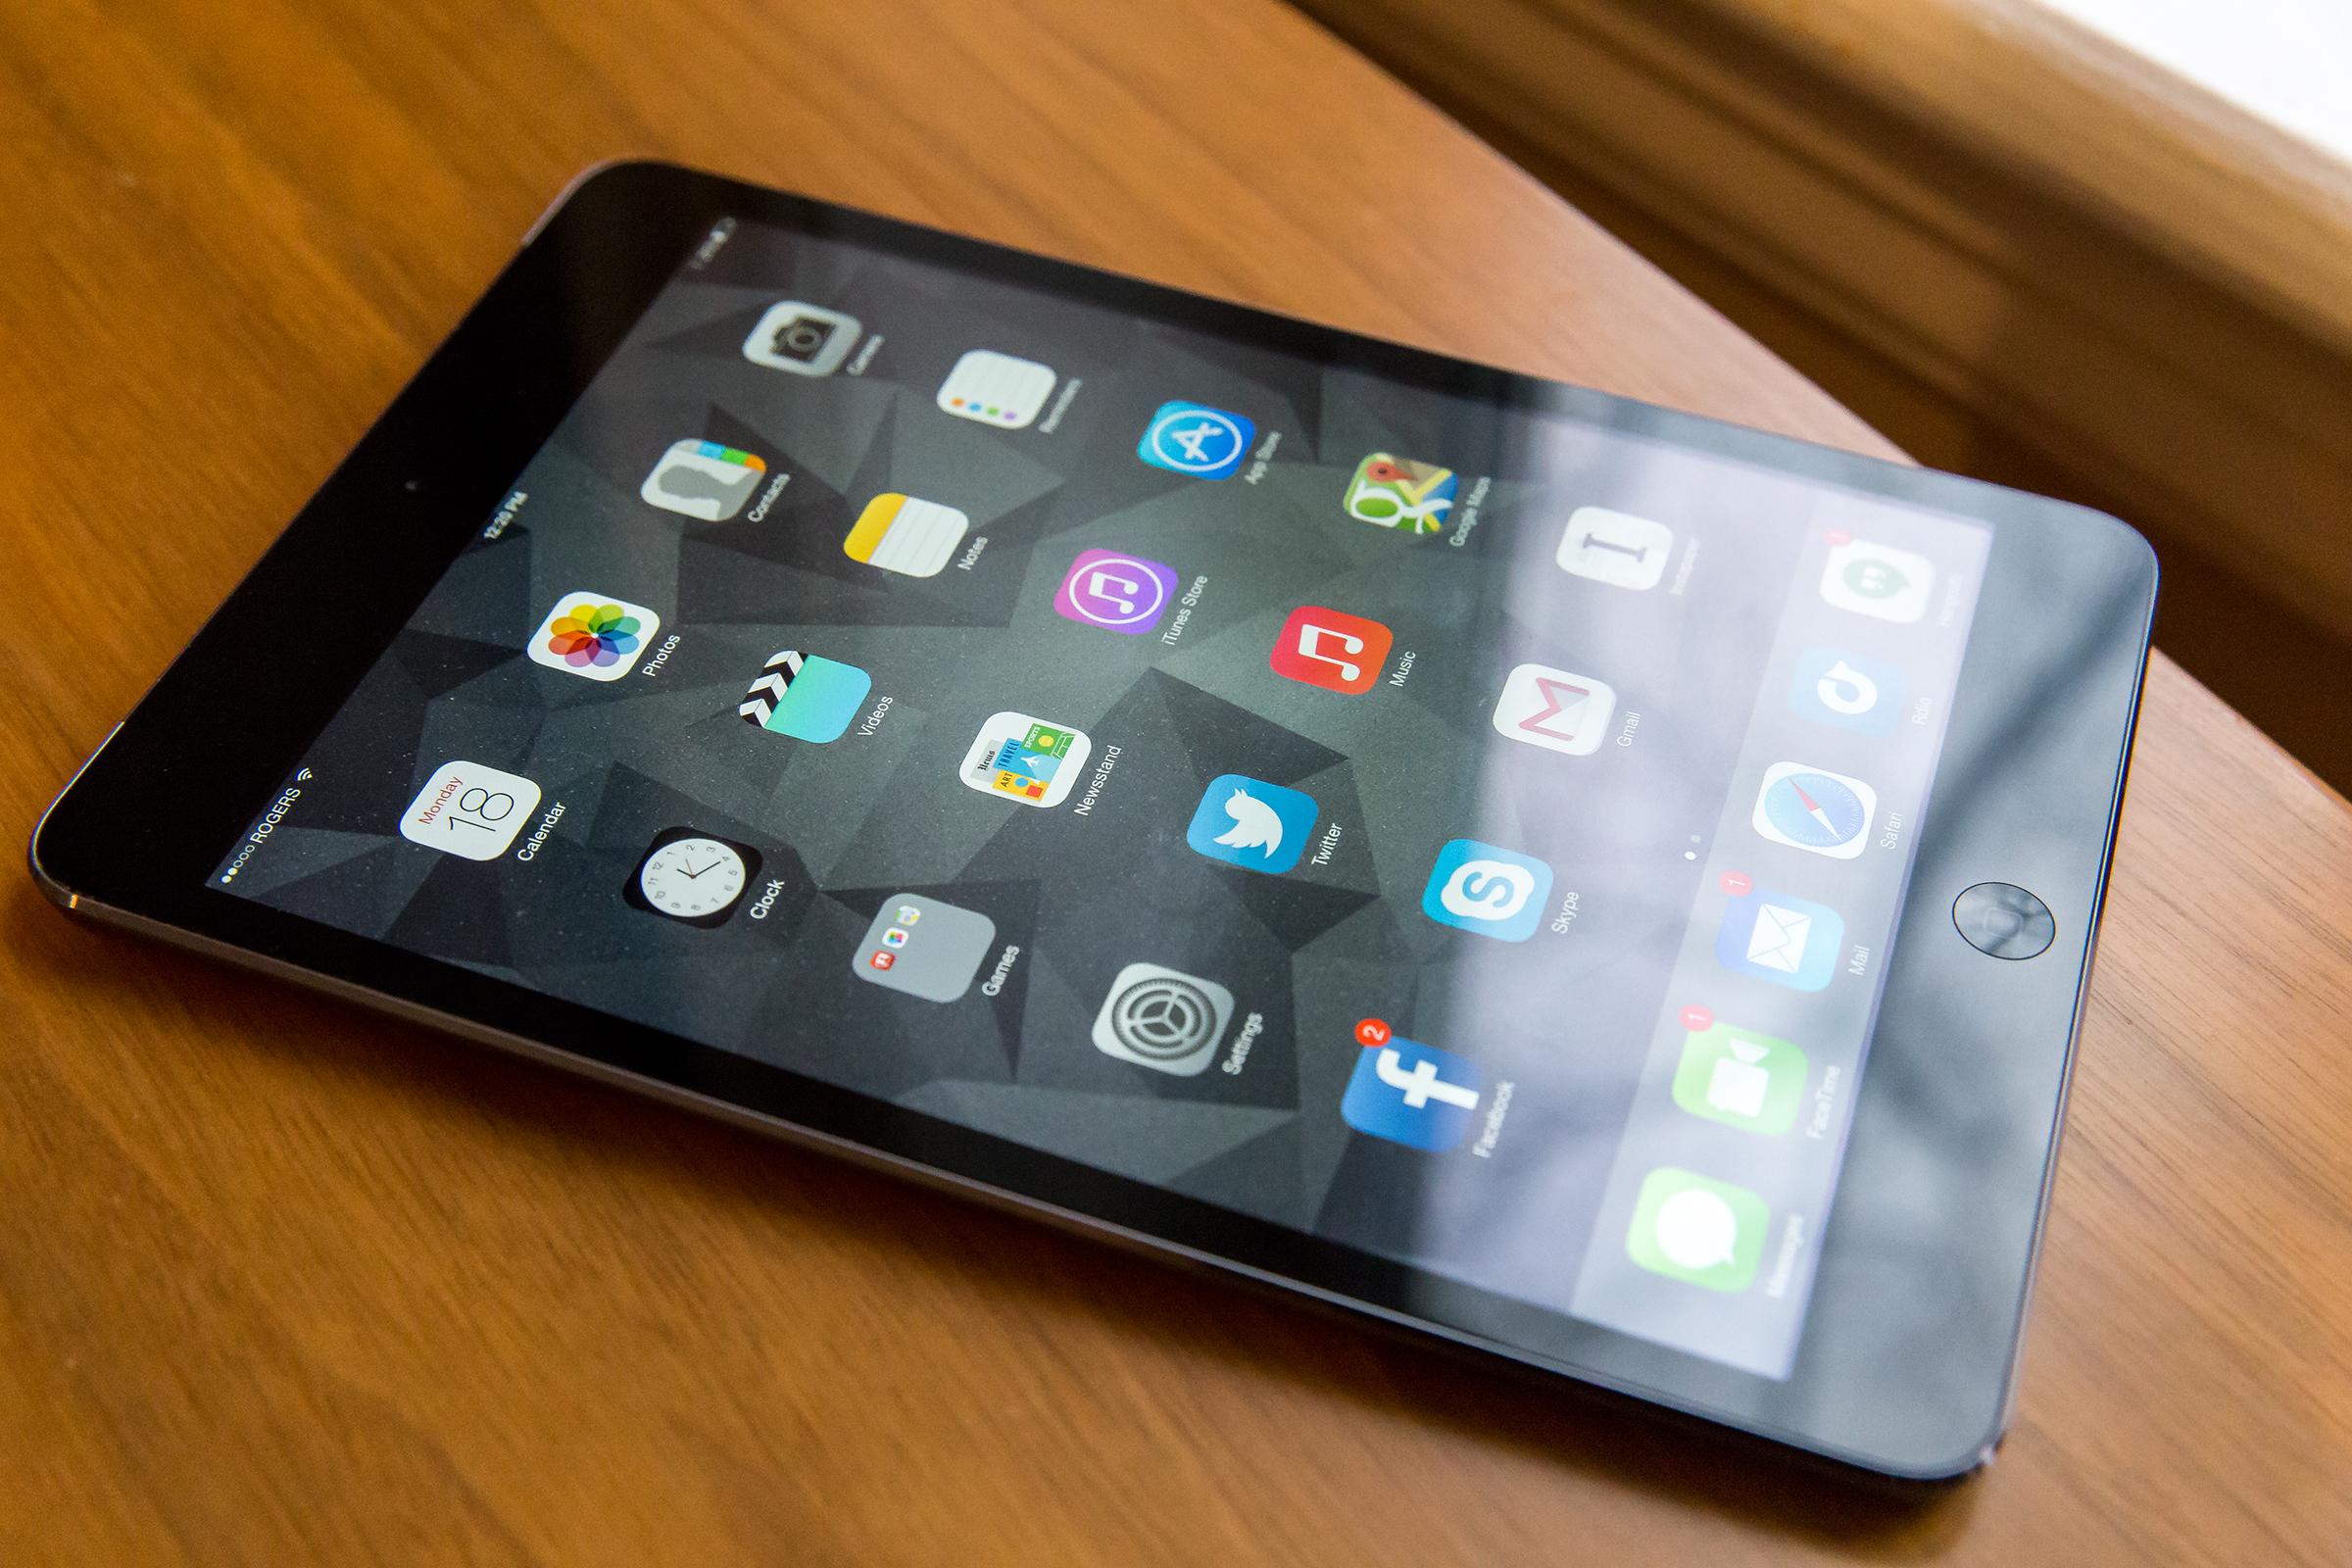 Ipad Retina: IPad Mini With Retina Display Review: The Best Tablet On